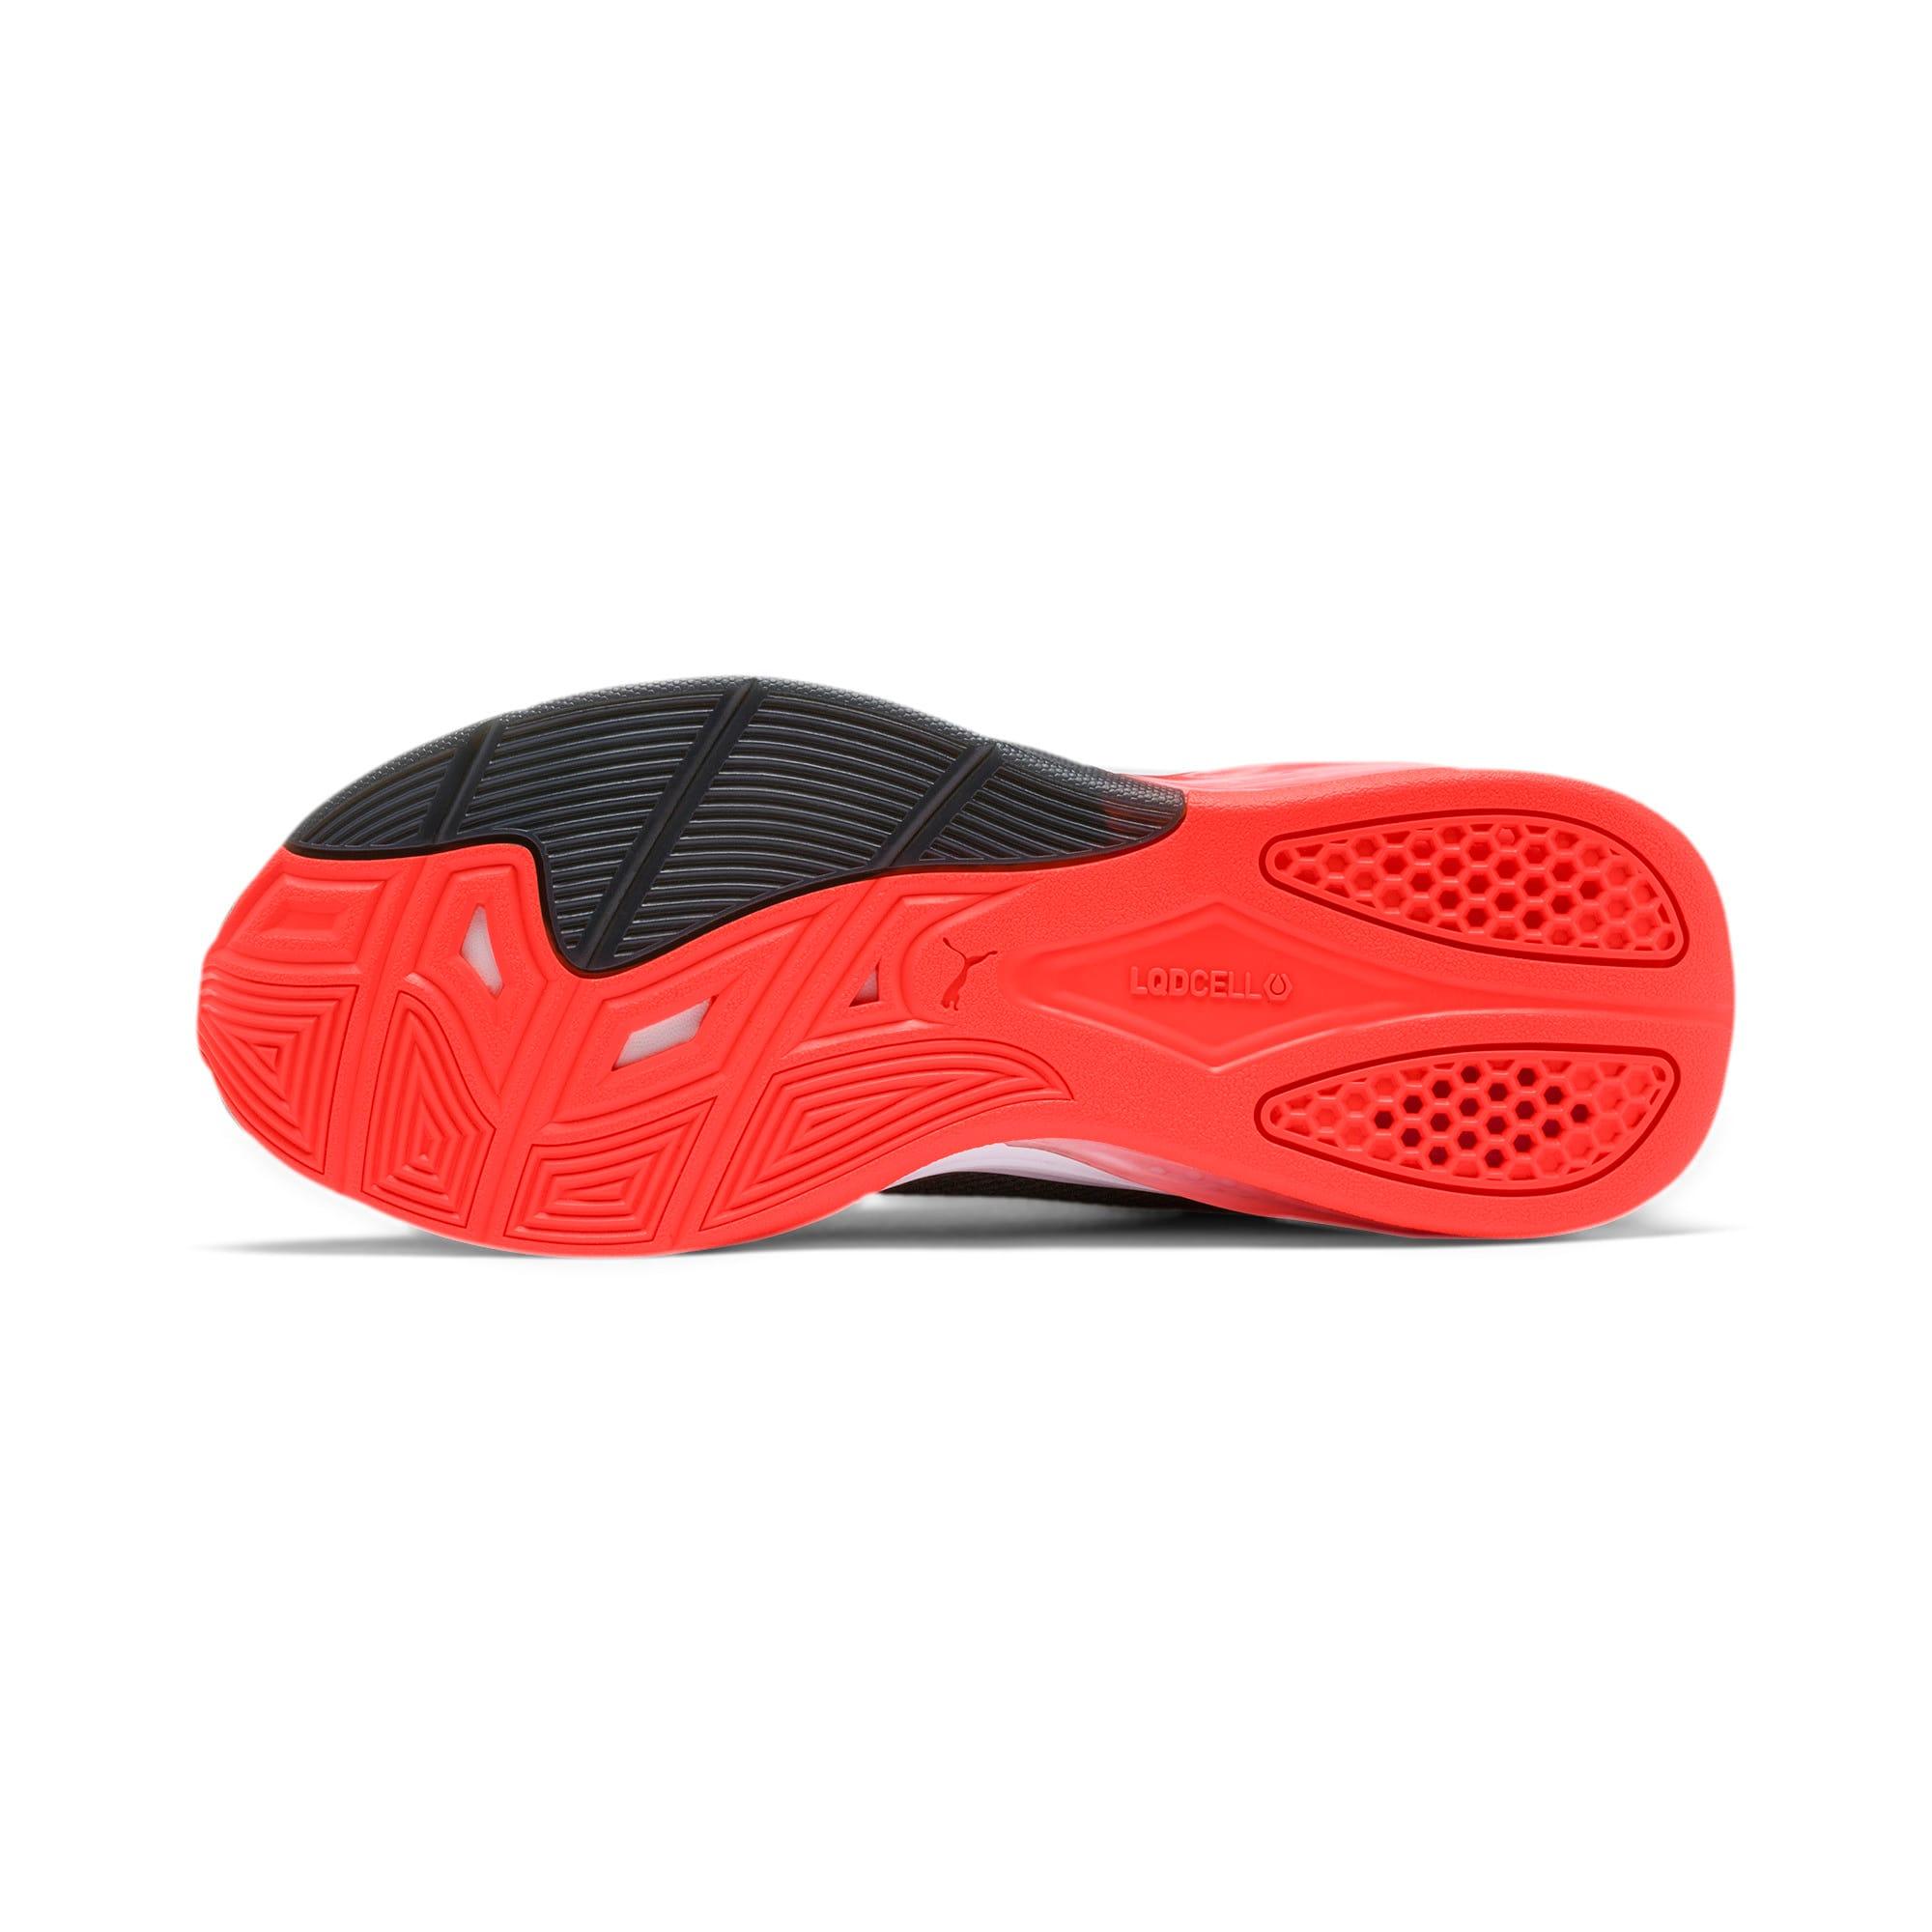 Thumbnail 5 of LQDCELL Tension Men's Training Shoes, CASTLEROCK-Nrgy Red-Y Alert, medium